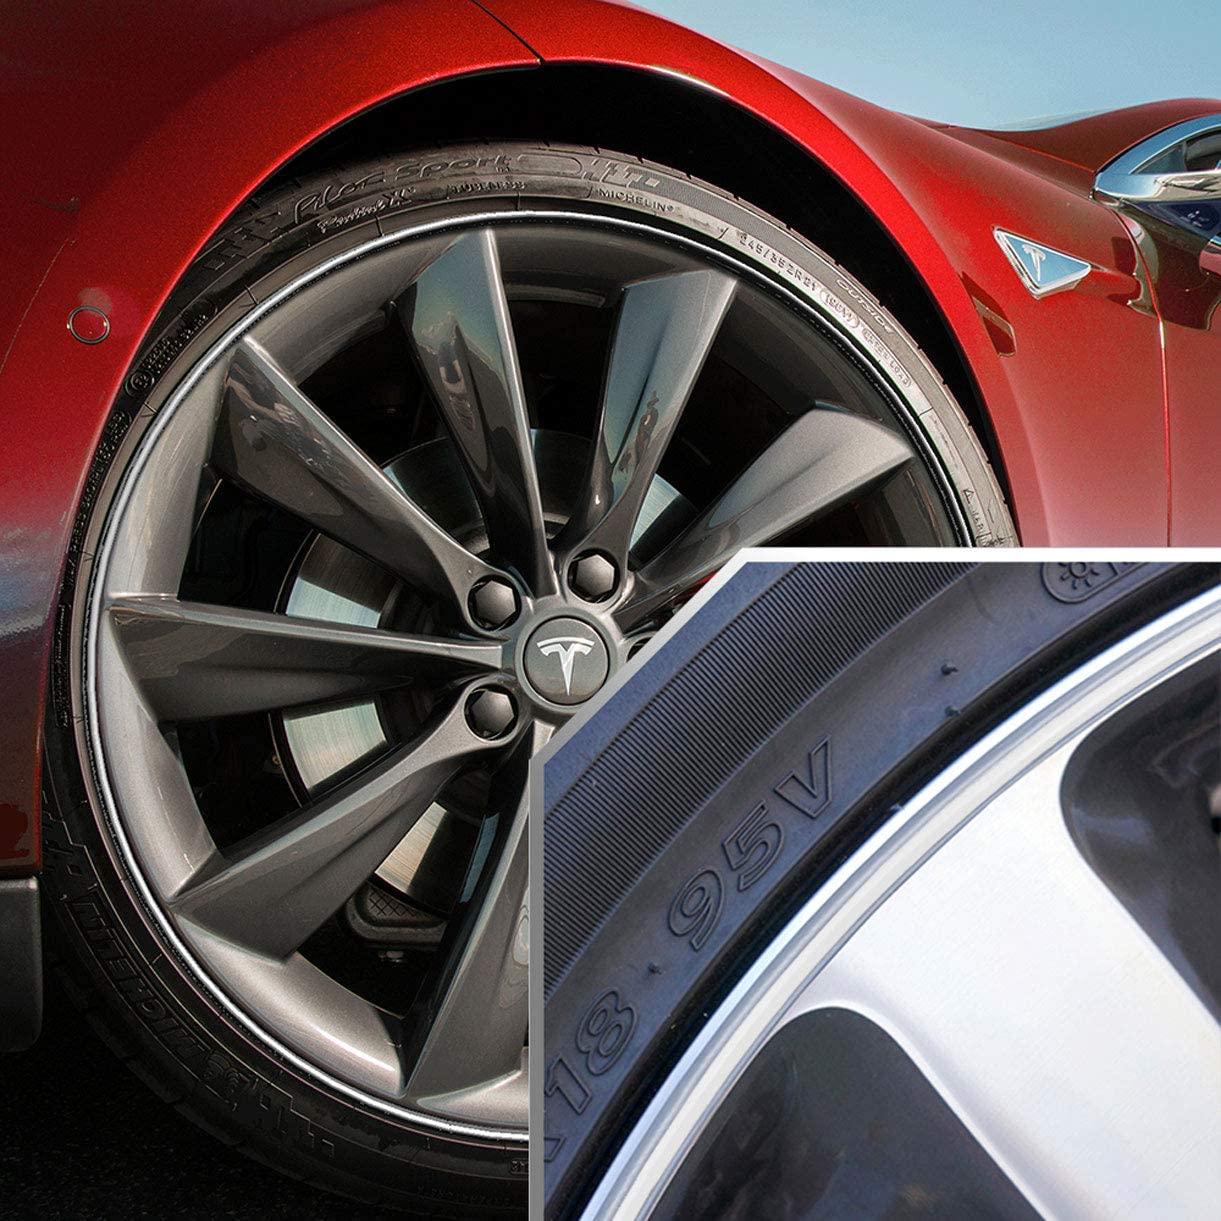 Upgrade Your Auto Wheel Bands White in Silver Pinstripe Rim Edge Trim for Tesla (Full Kit)